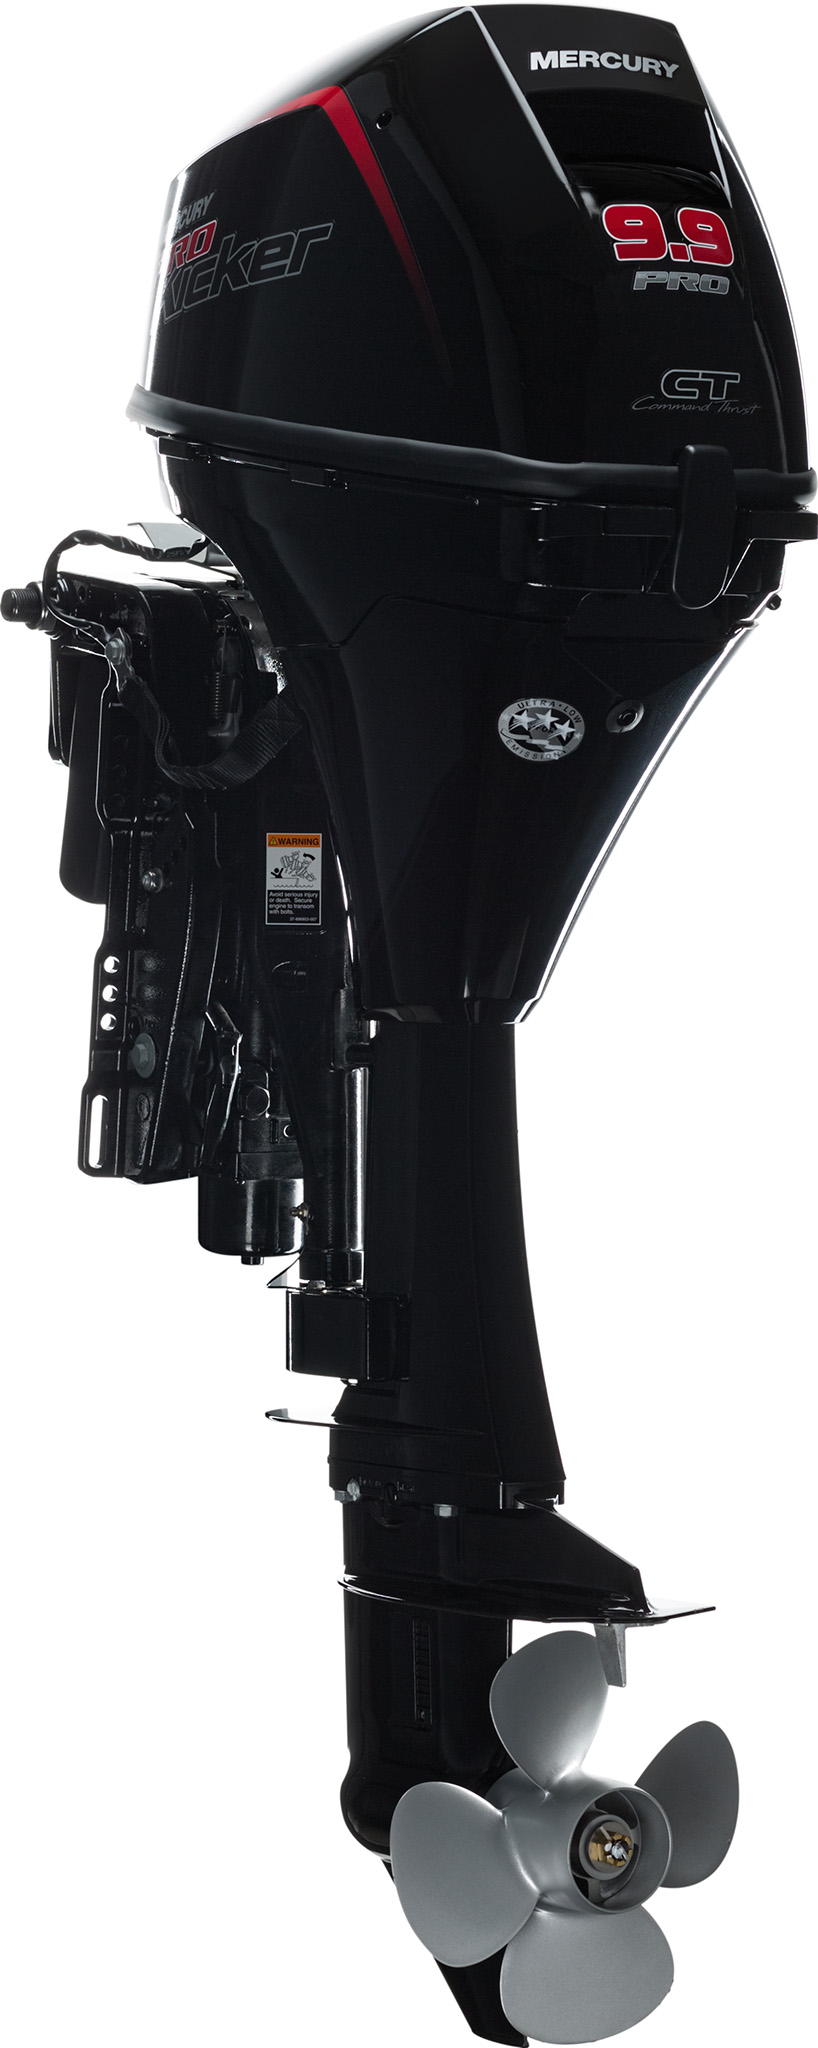 Mercury 9.9 HP ProKicker Fourstroke